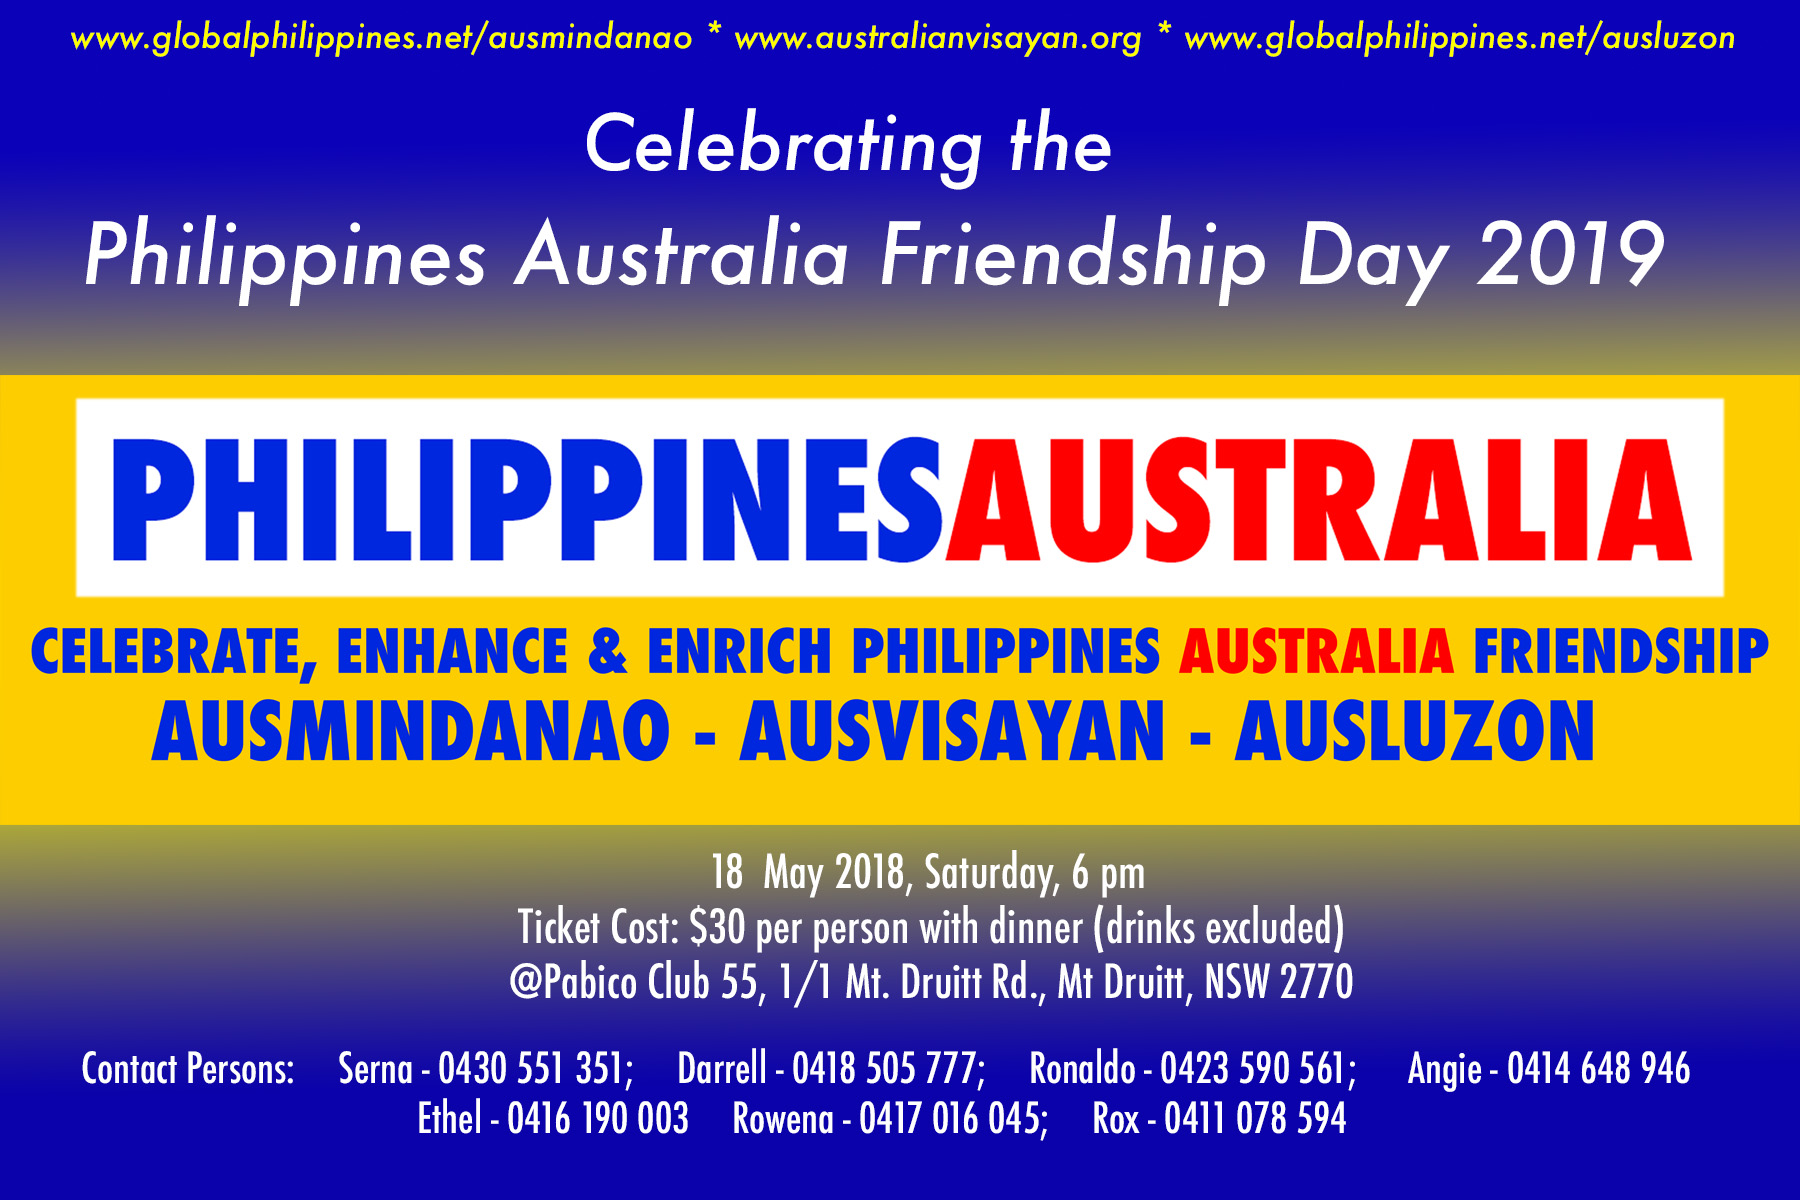 2019 Philippines Australia Friendship